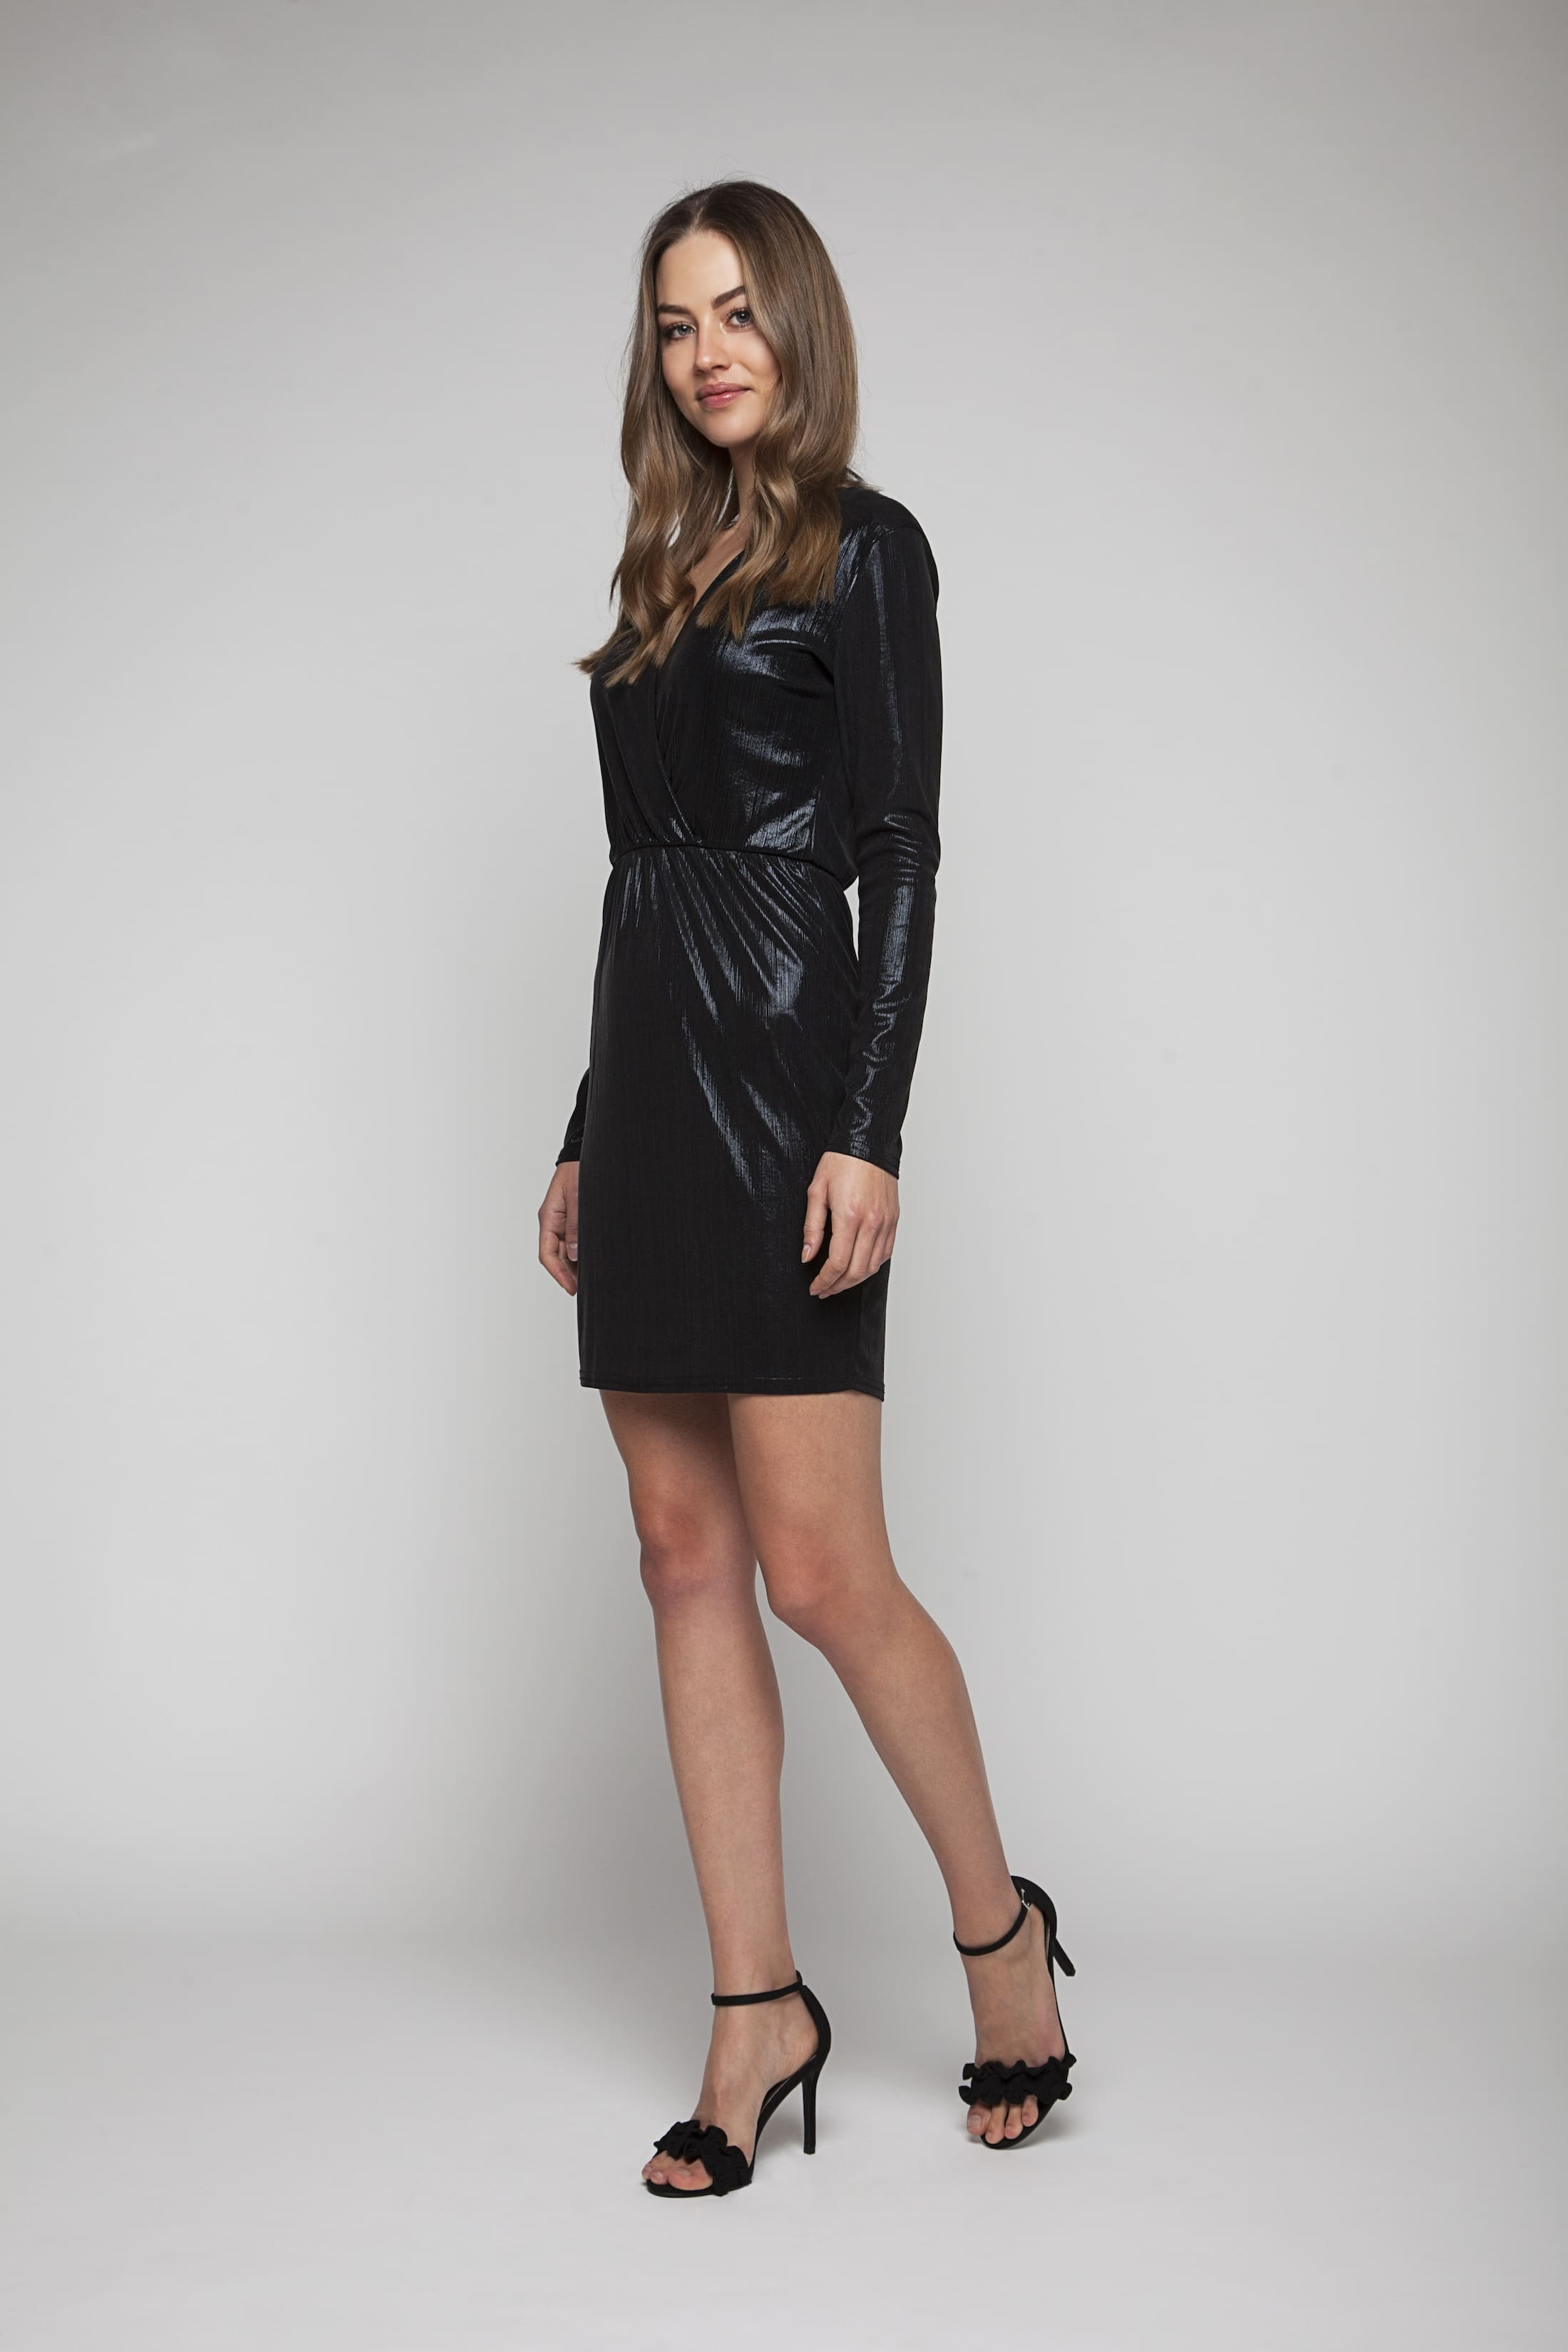 Black shimmering evening dress